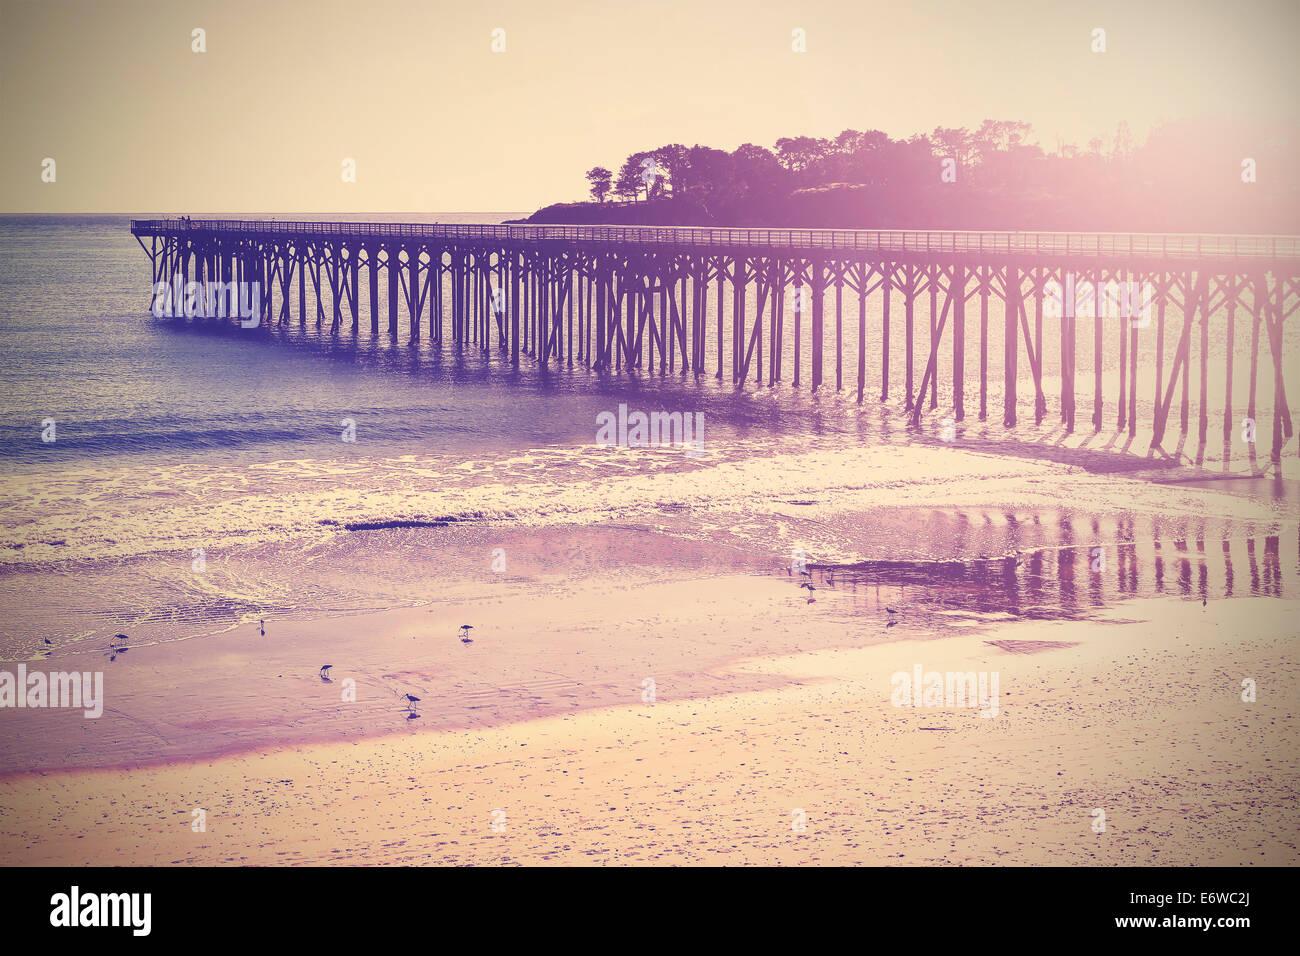 Bois Vintage bridge at sunset beach, Californie, USA. Photo Stock